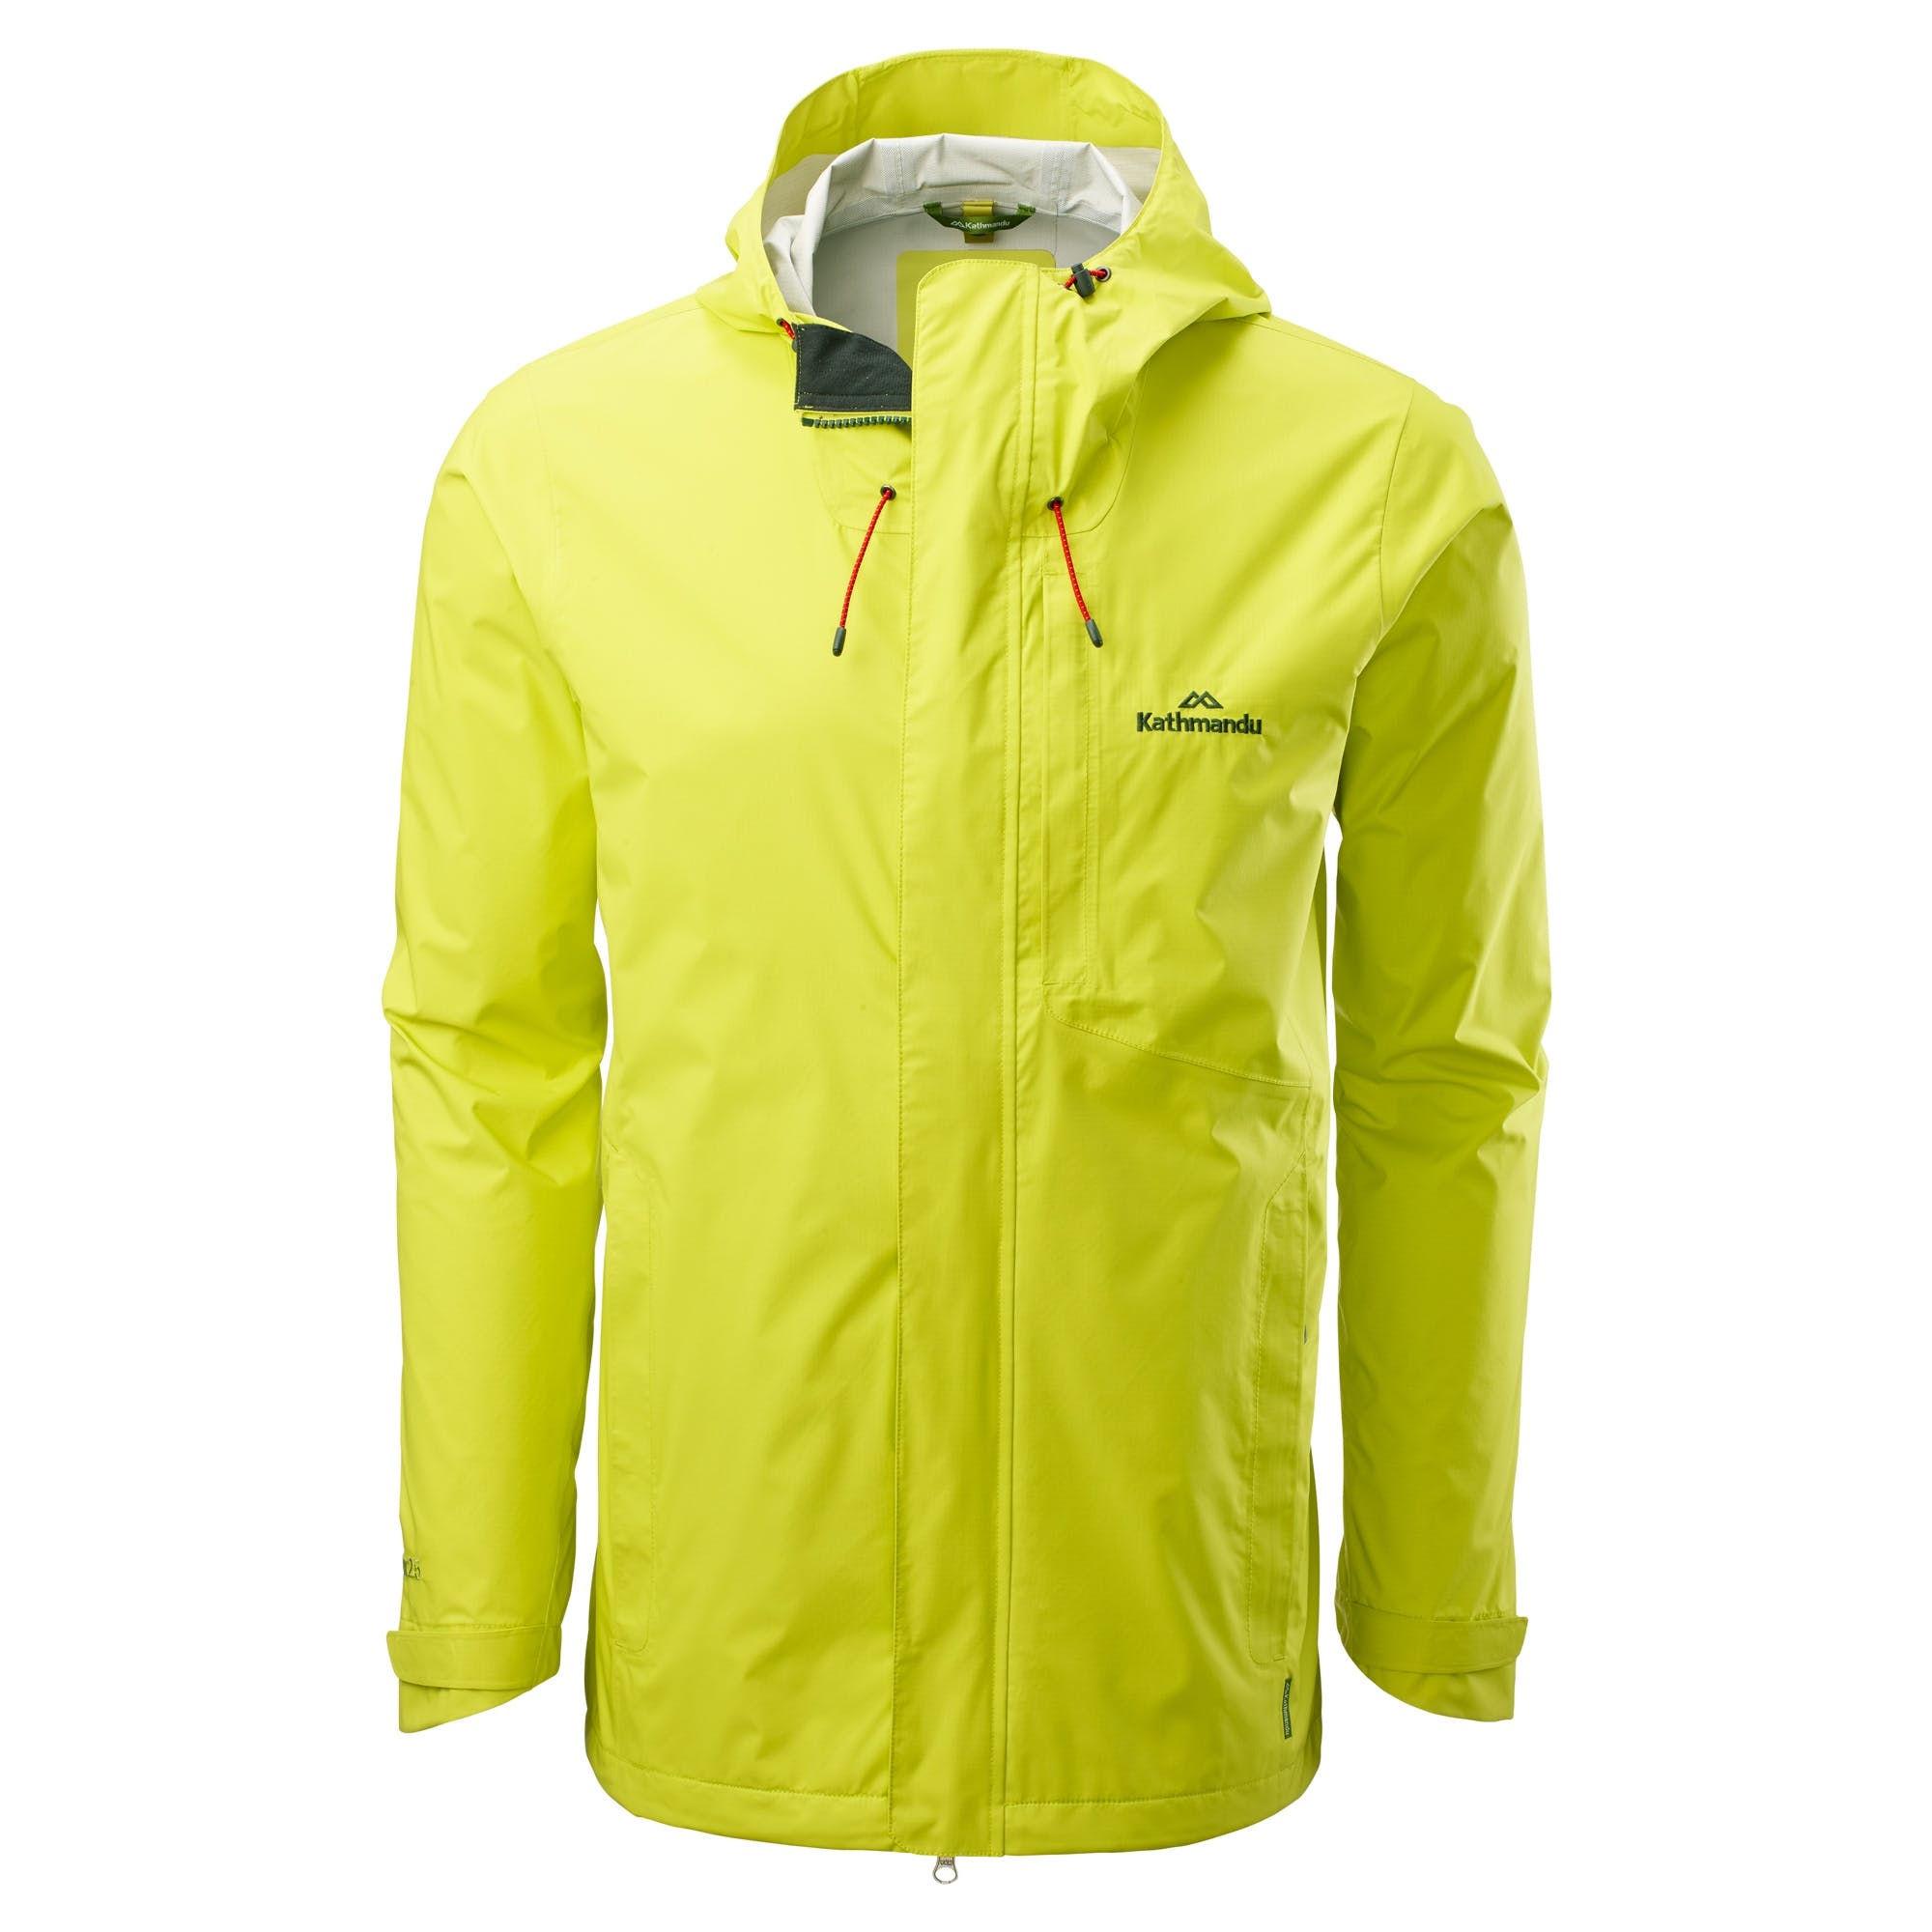 wiggle.com | Kathmandu Trailhead Men's Rain Jacket | Jackets